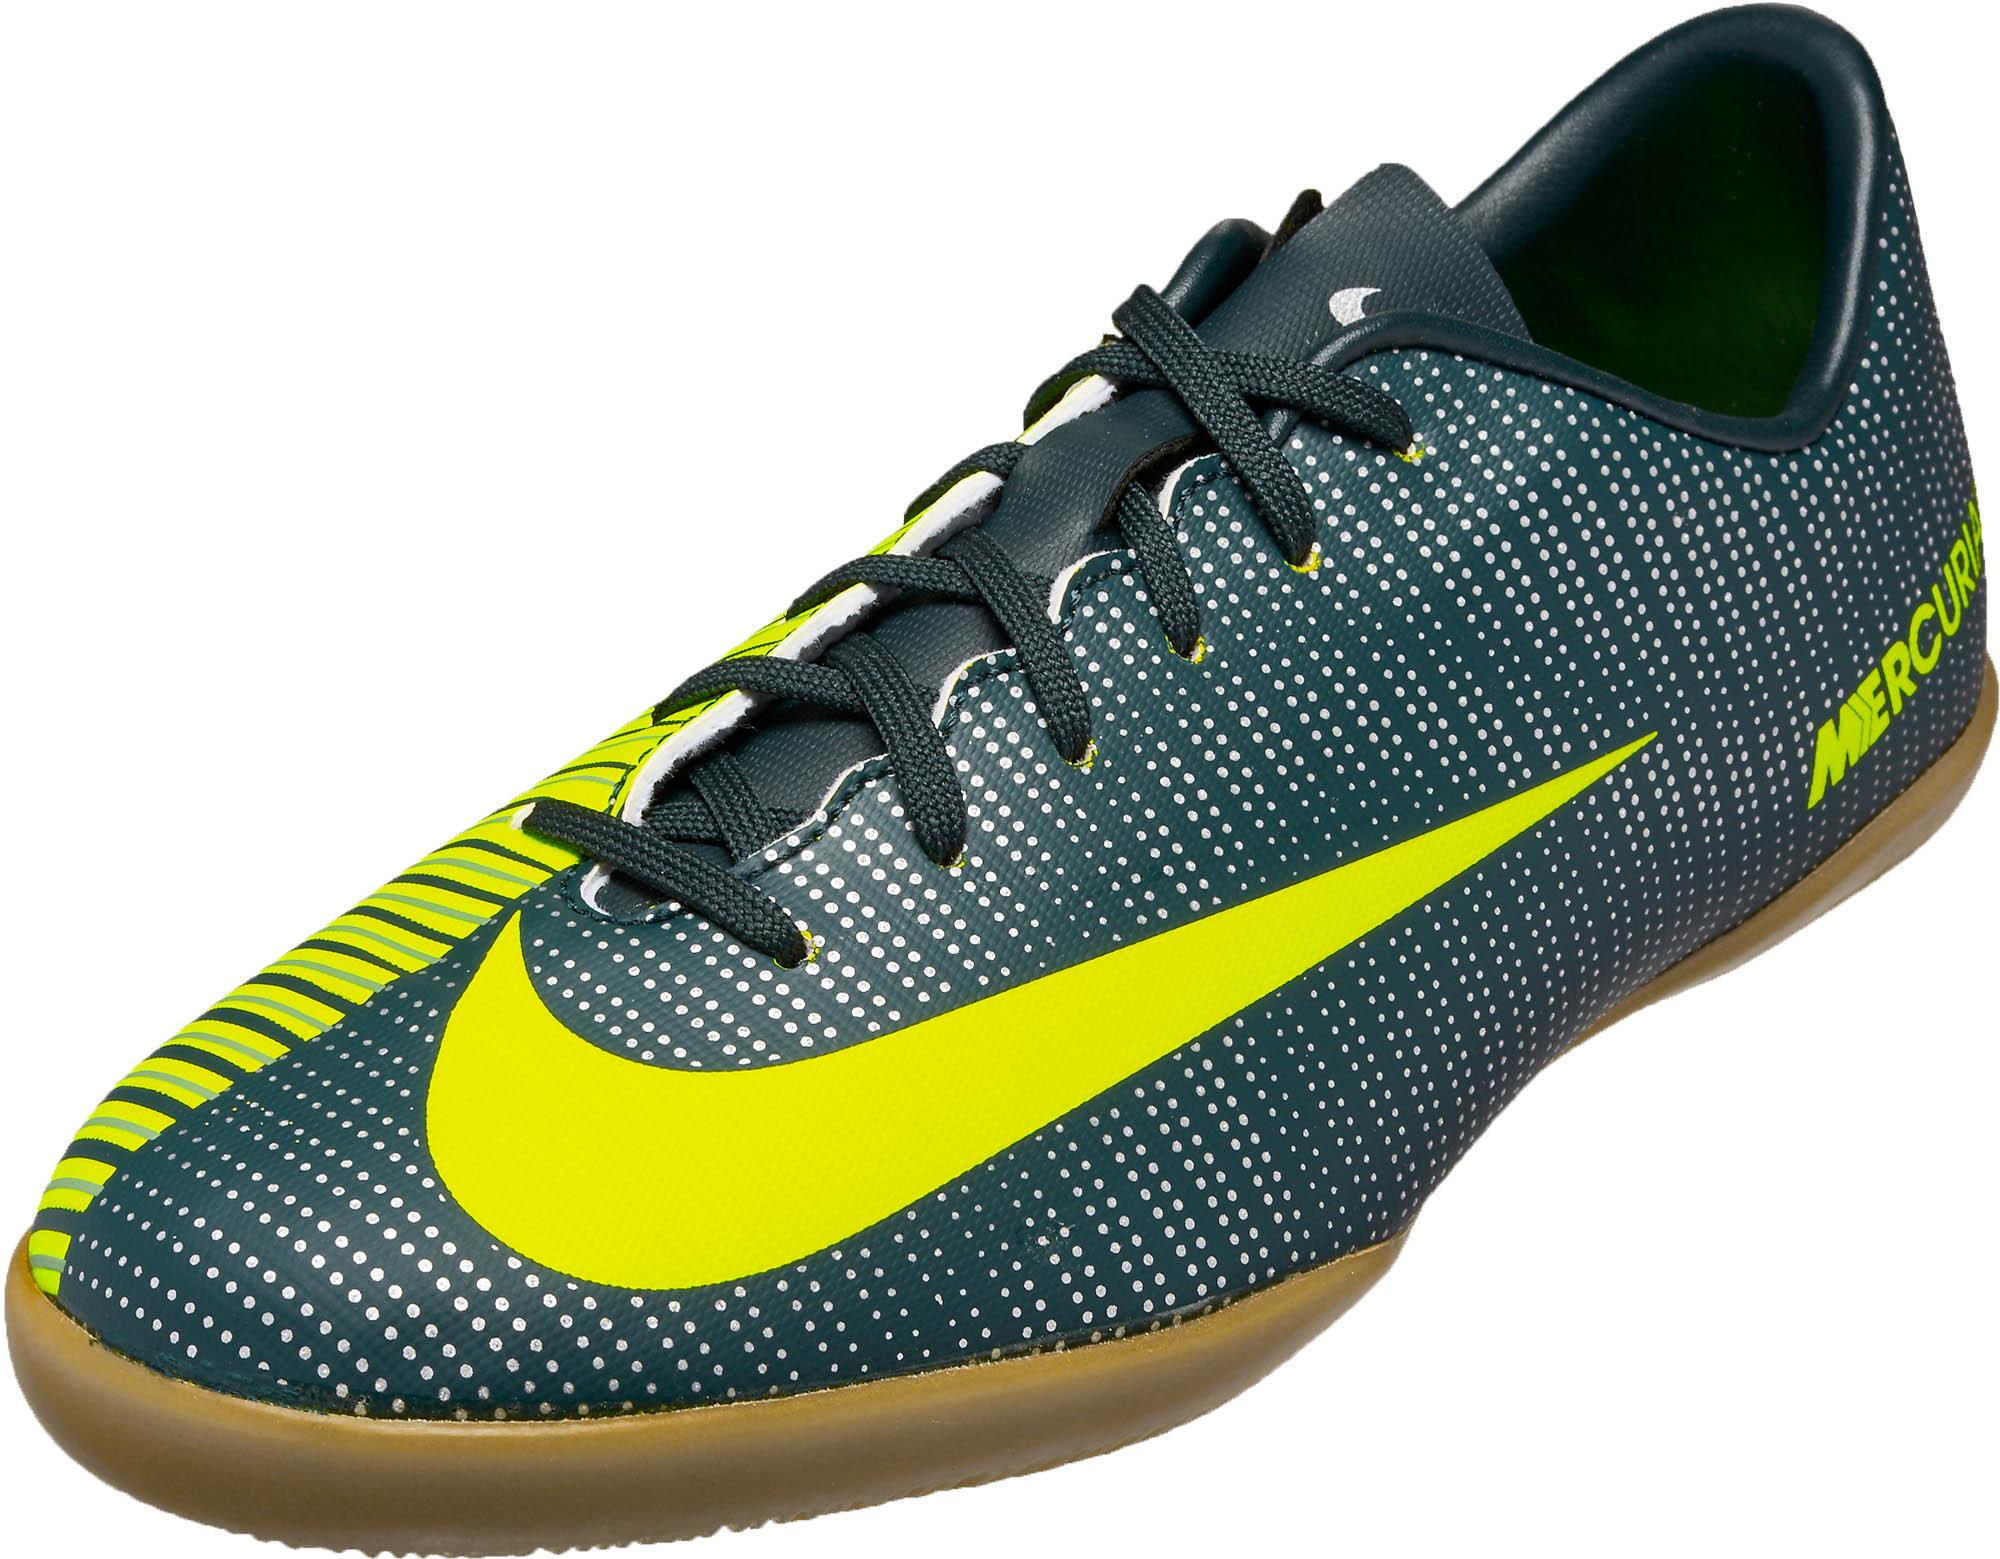 separation shoes 6af92 4dadb Nike Kids Mercurial Vapor XI IC – CR7 – Seaweed Hasta